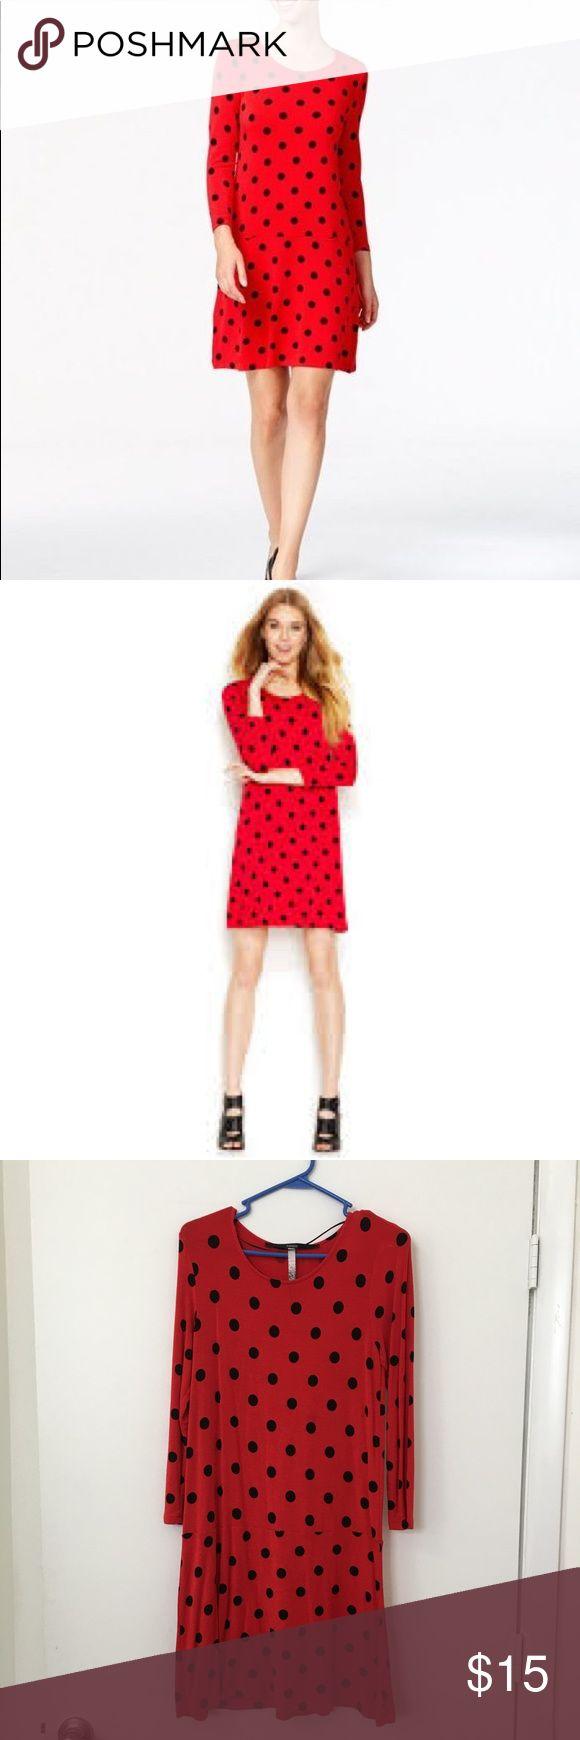 Kensie Red Dress w. Black Polka Dot Great work or night out dress, quarter sleeves, size Small Kensie Dresses Midi